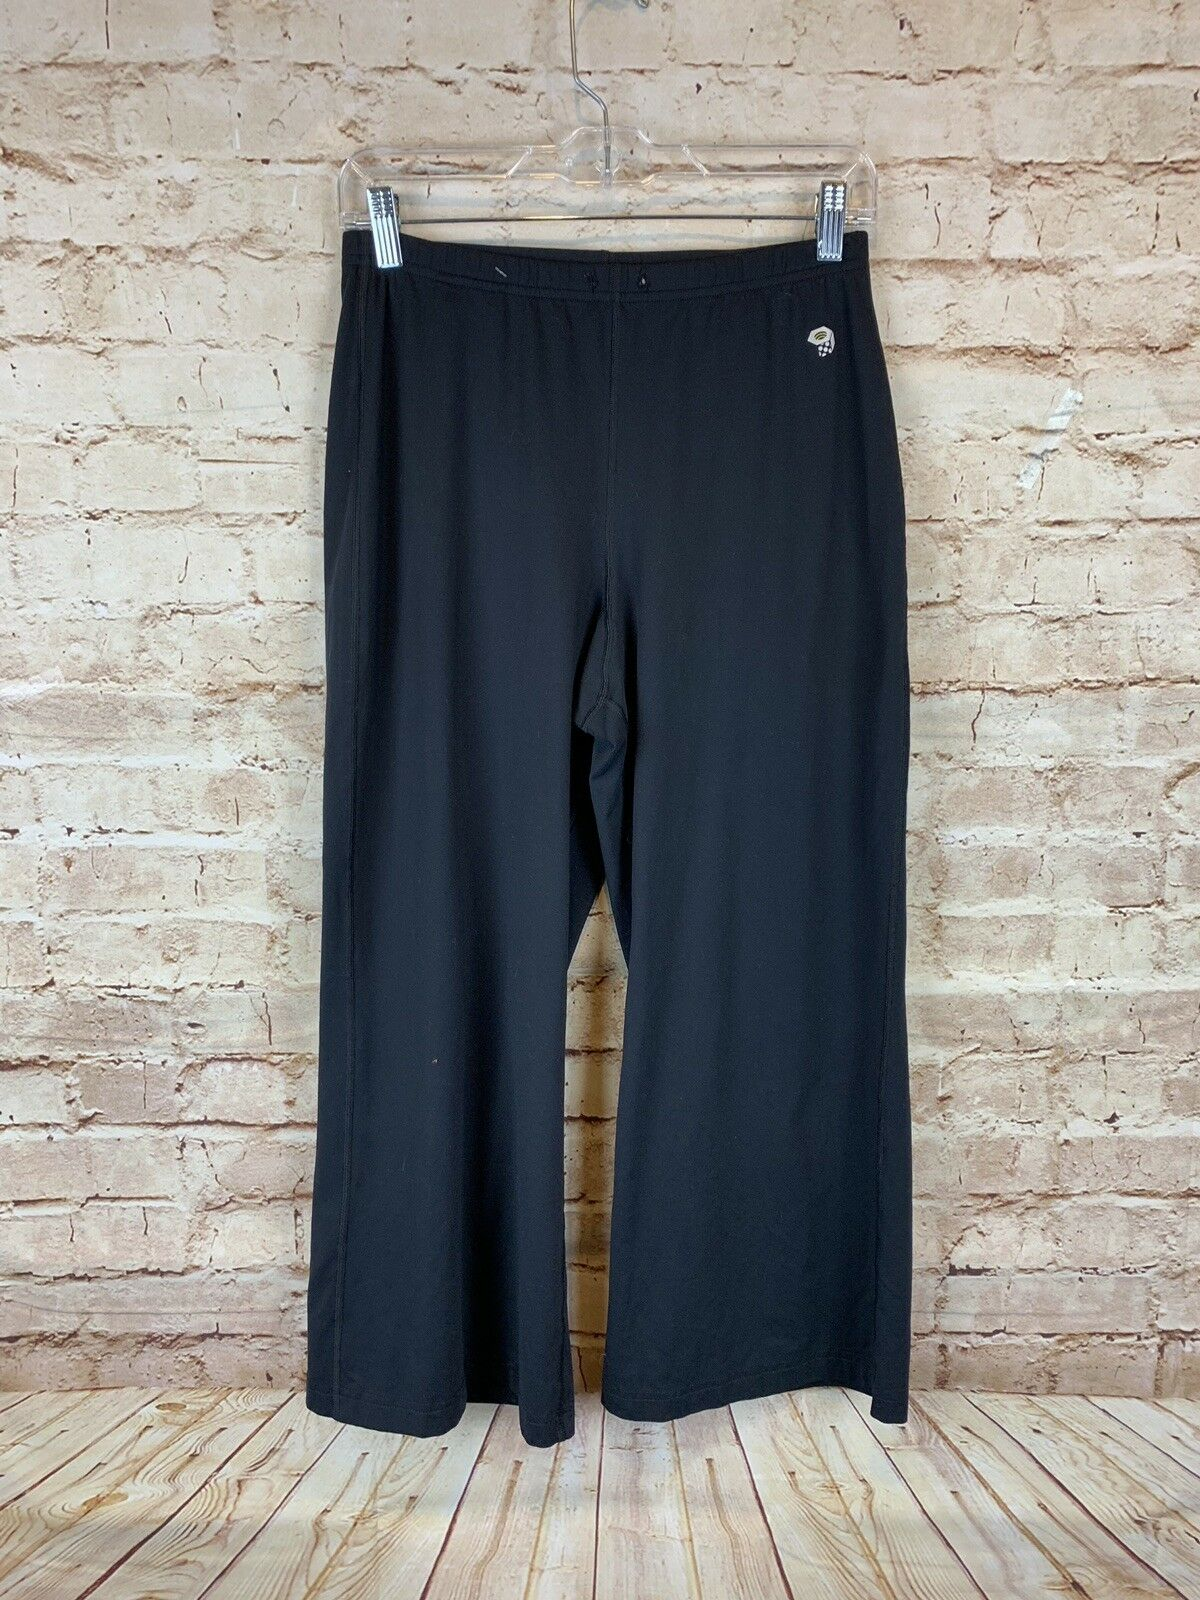 Mountain Hardwear capri sz S black loose fit cropped NO DRAWSTRING elastic waist